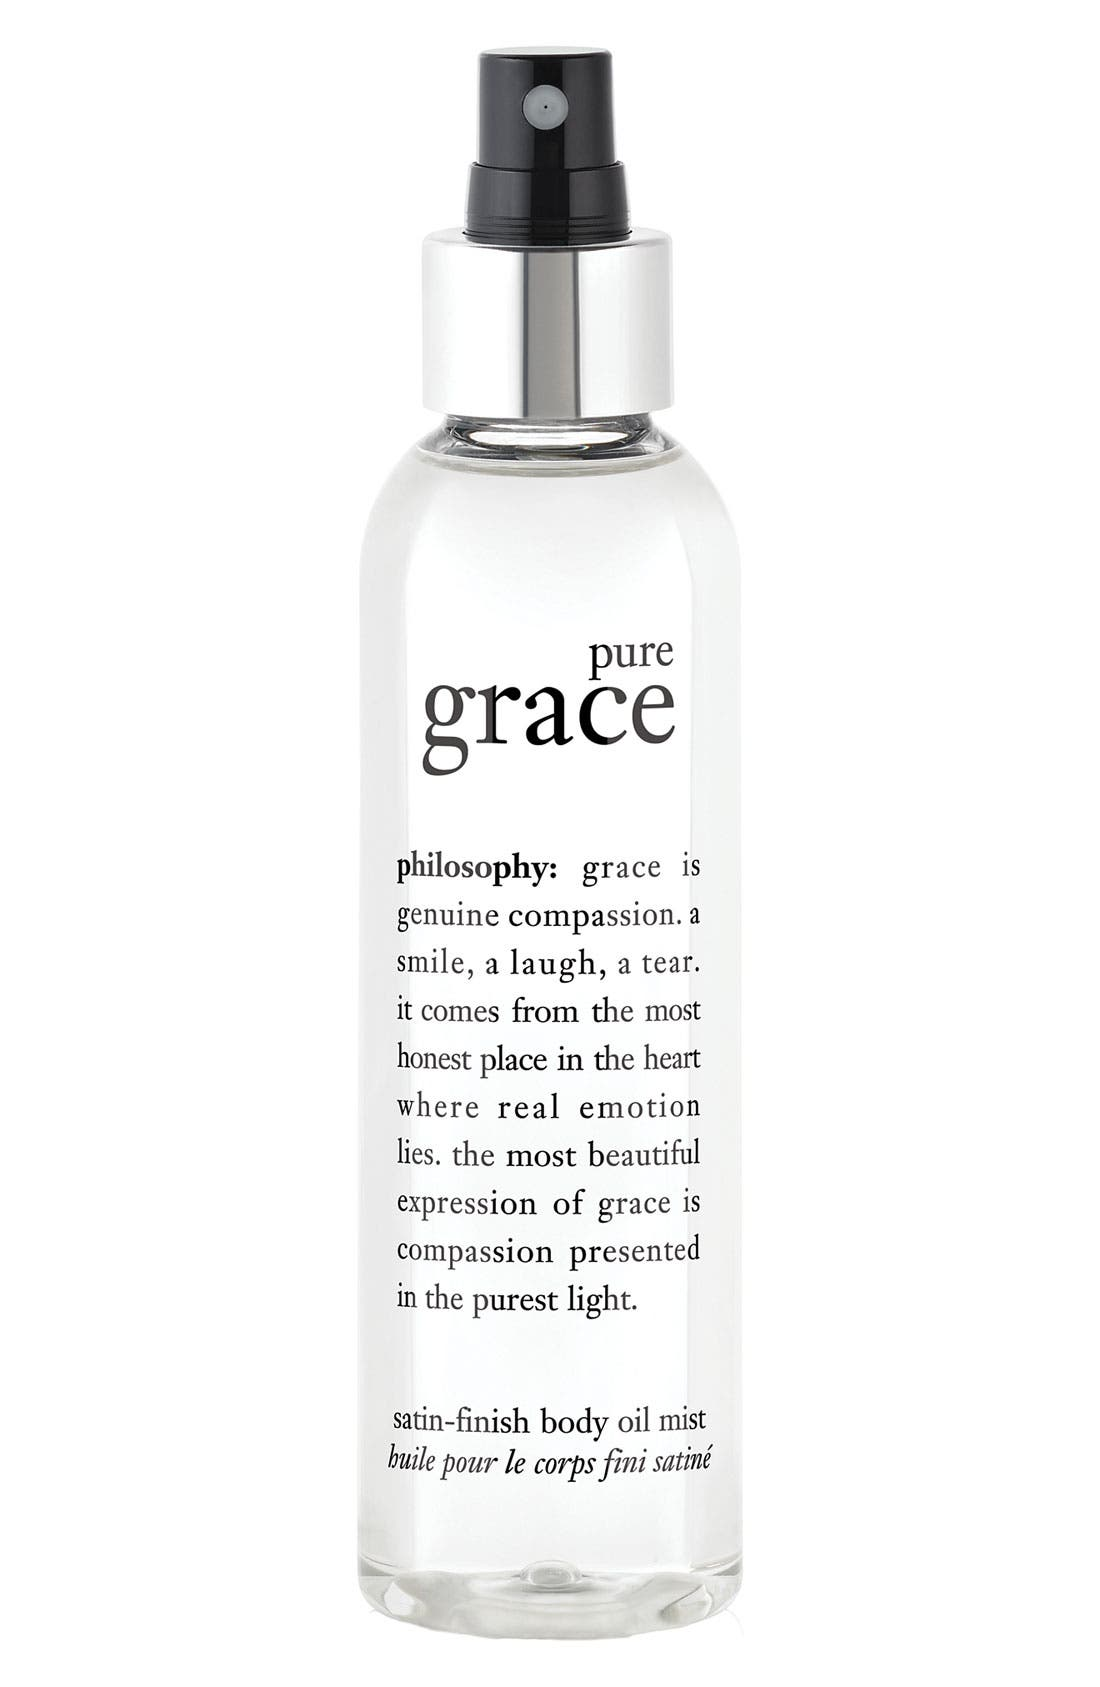 philosophy 'pure grace' satin-finish body oil mist